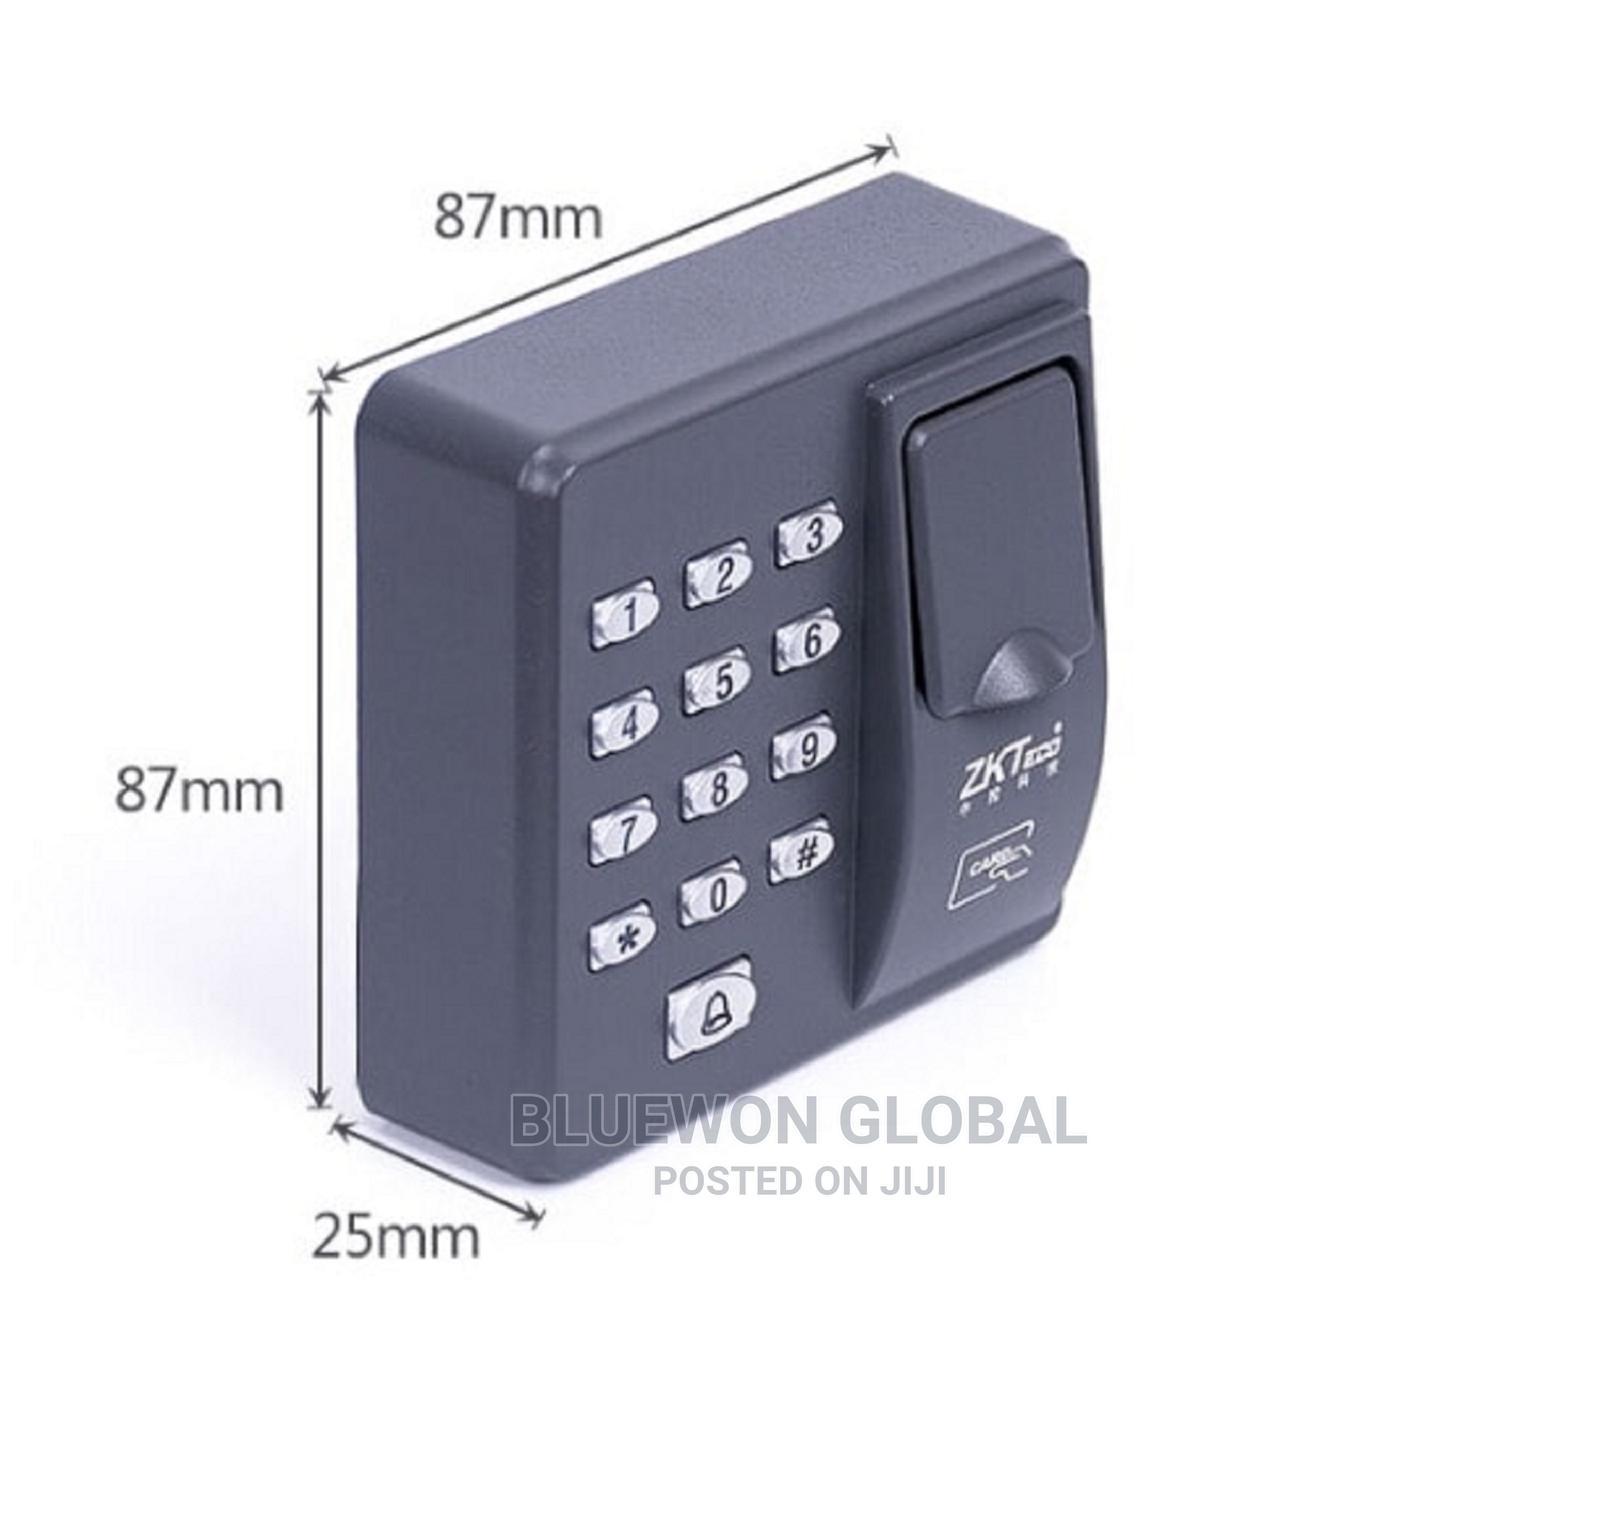 X6 ZKTECO Fingerprint Access Control System Card Reader   Safetywear & Equipment for sale in Ikeja, Lagos State, Nigeria